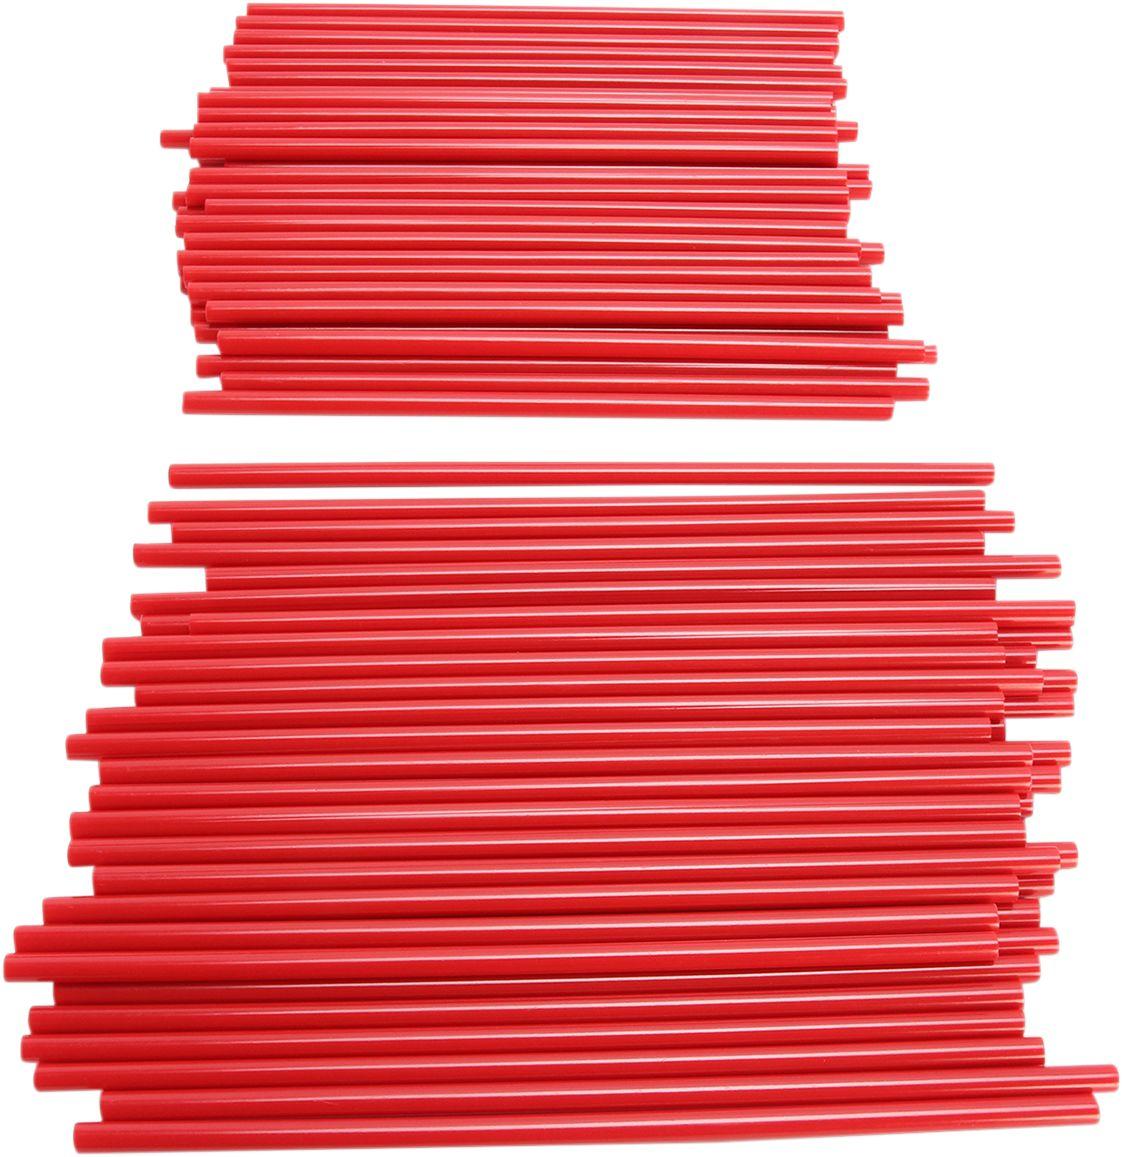 SPOKE COVERS RED 80PK